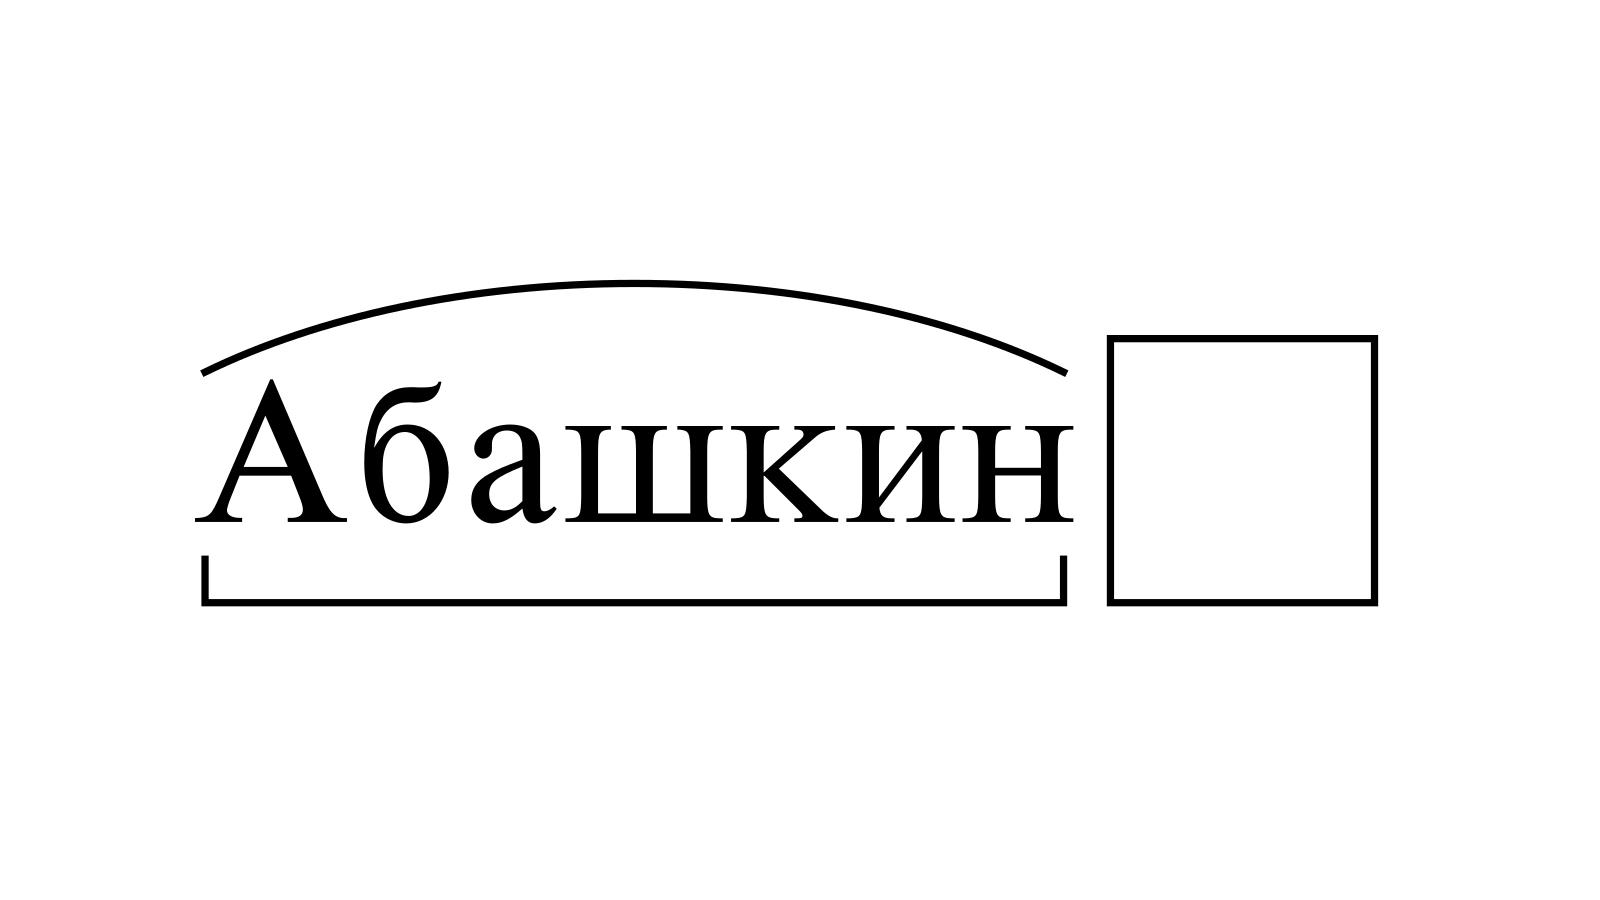 Разбор слова «Абашкин» по составу